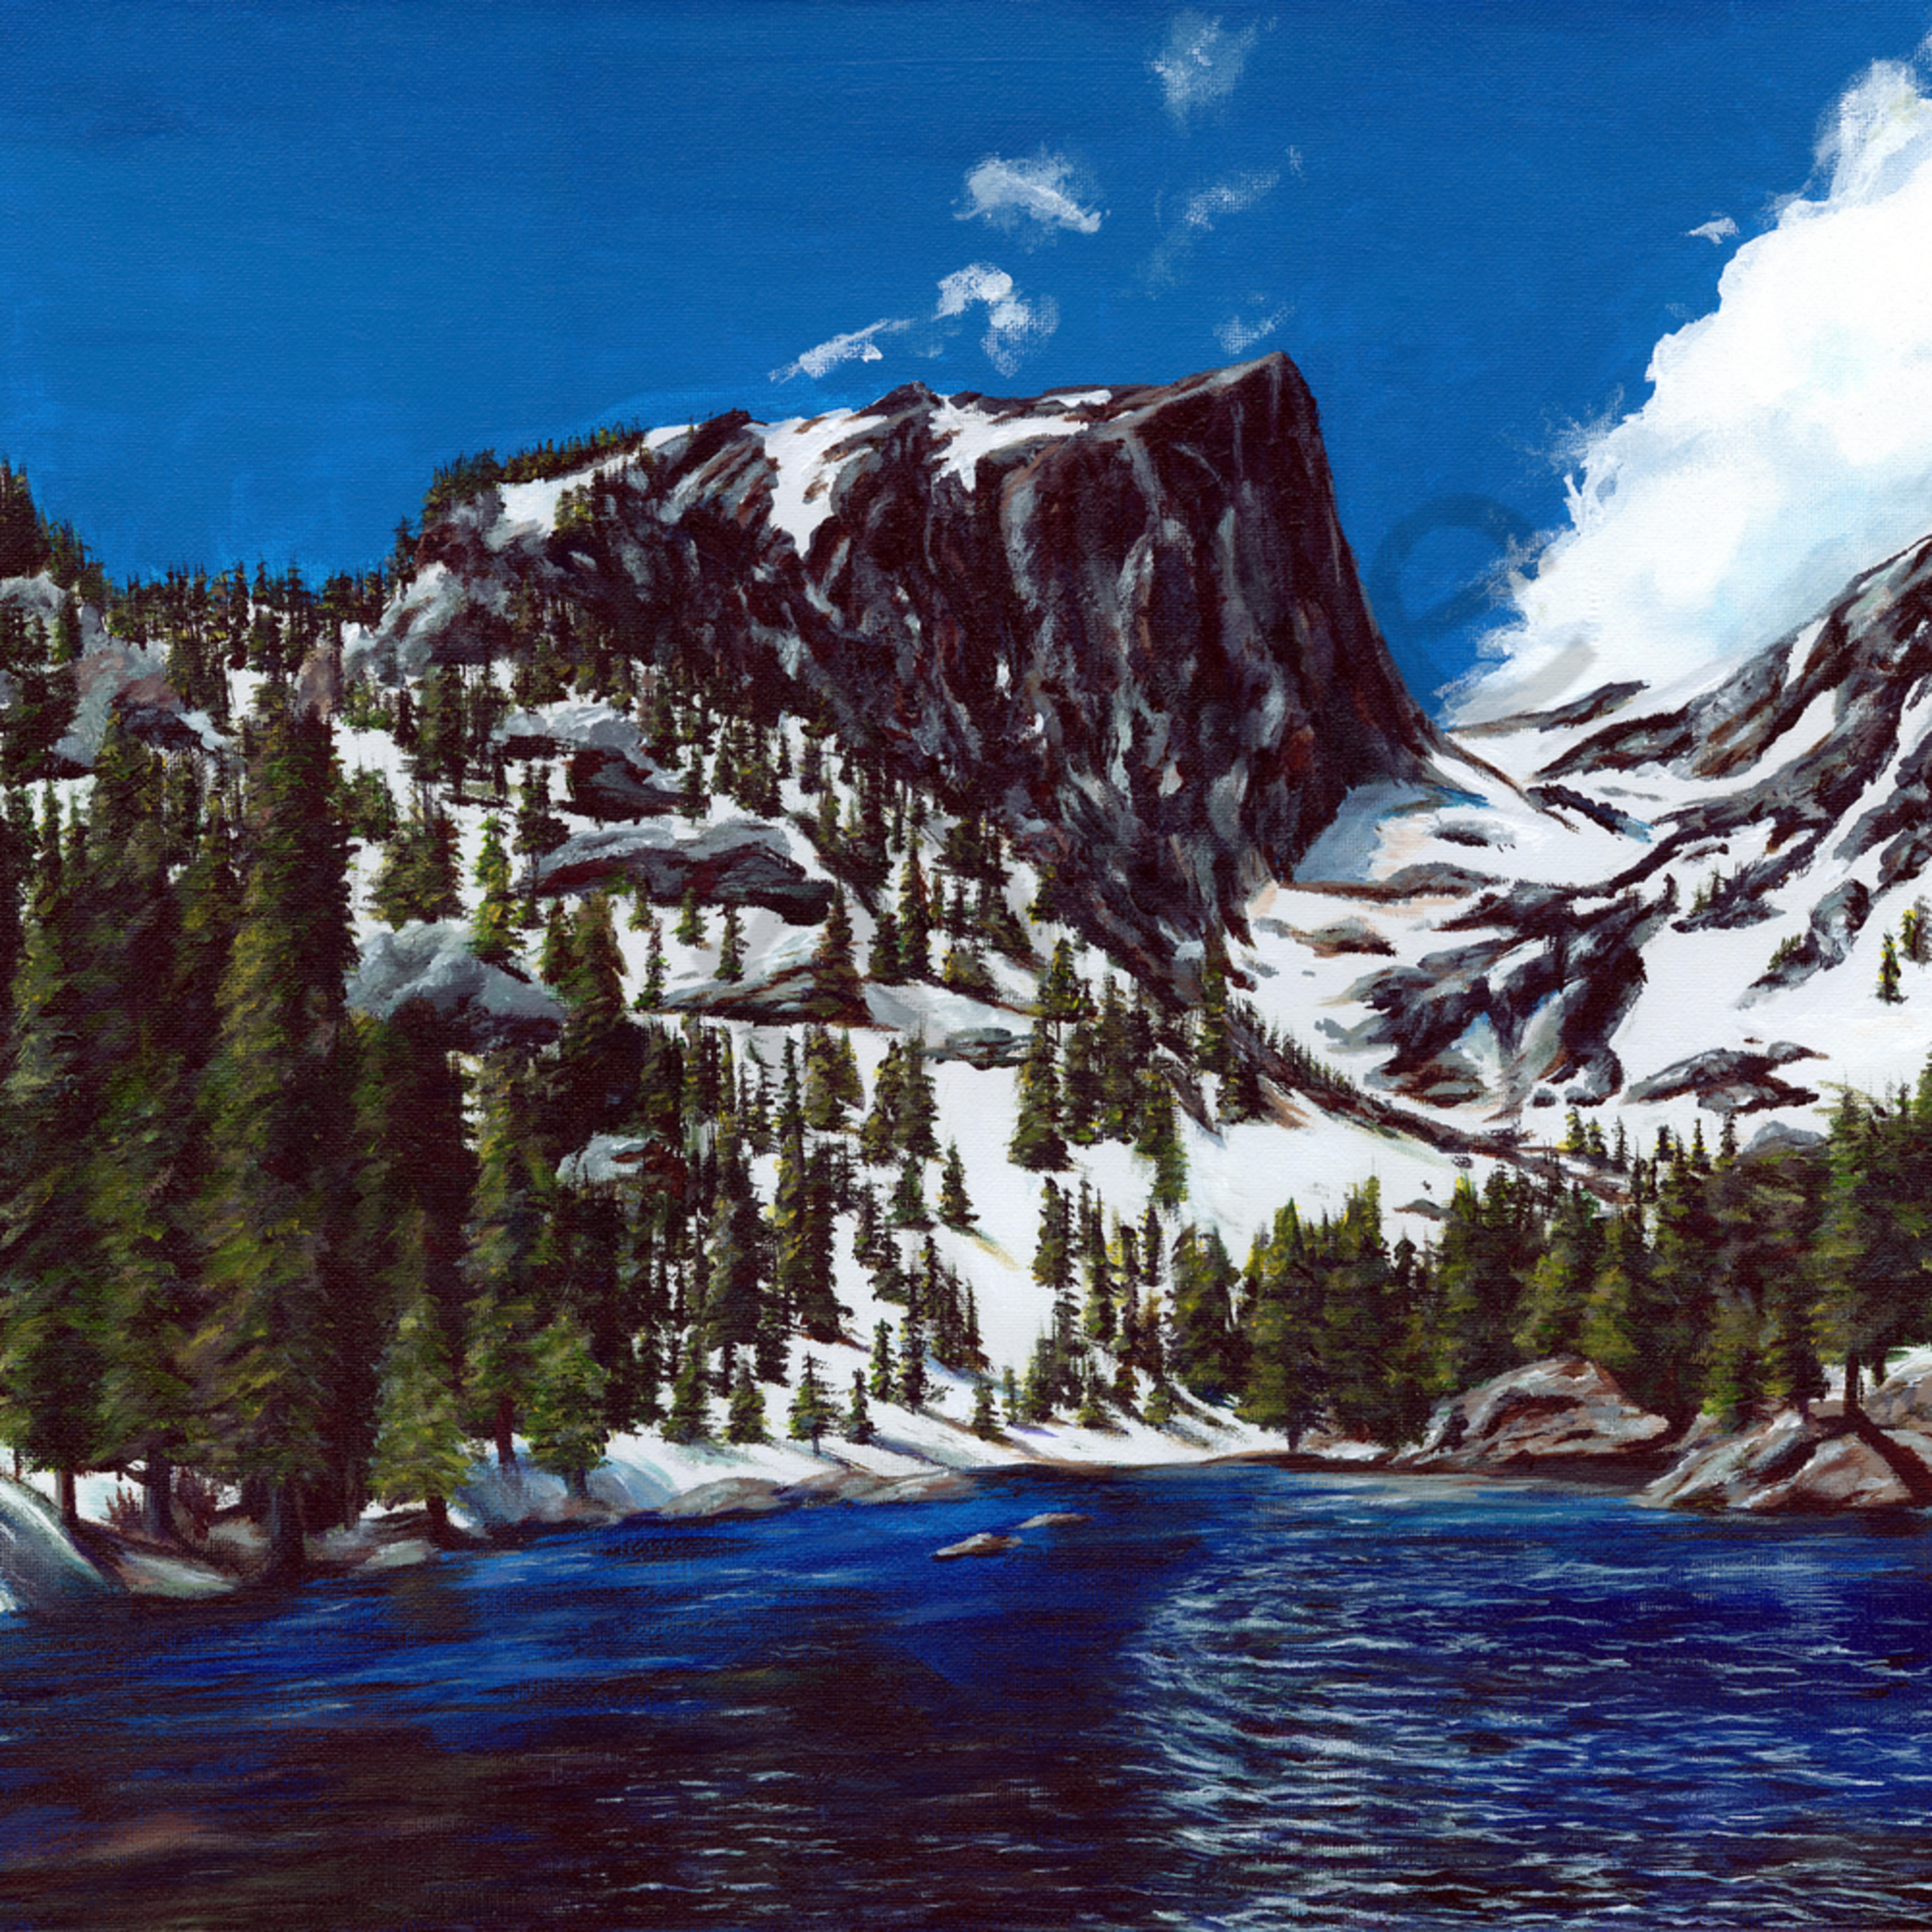 Dream lake450 fmdkzh